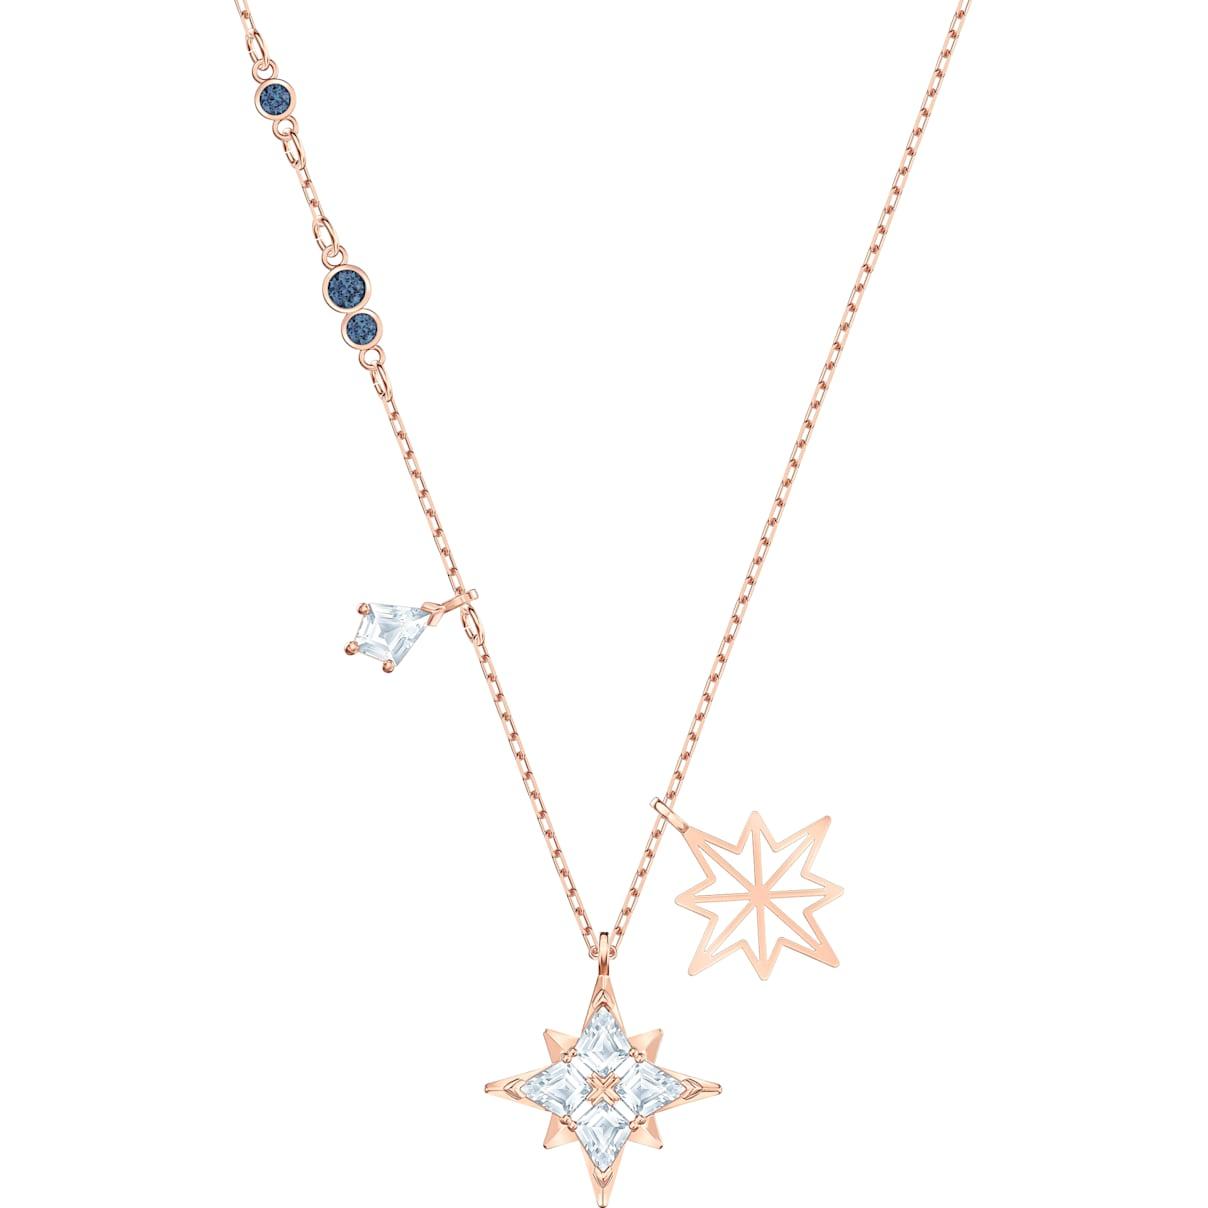 Swarovski Swarovski Symbolic Star Pendant, White, Rose-gold tone plated